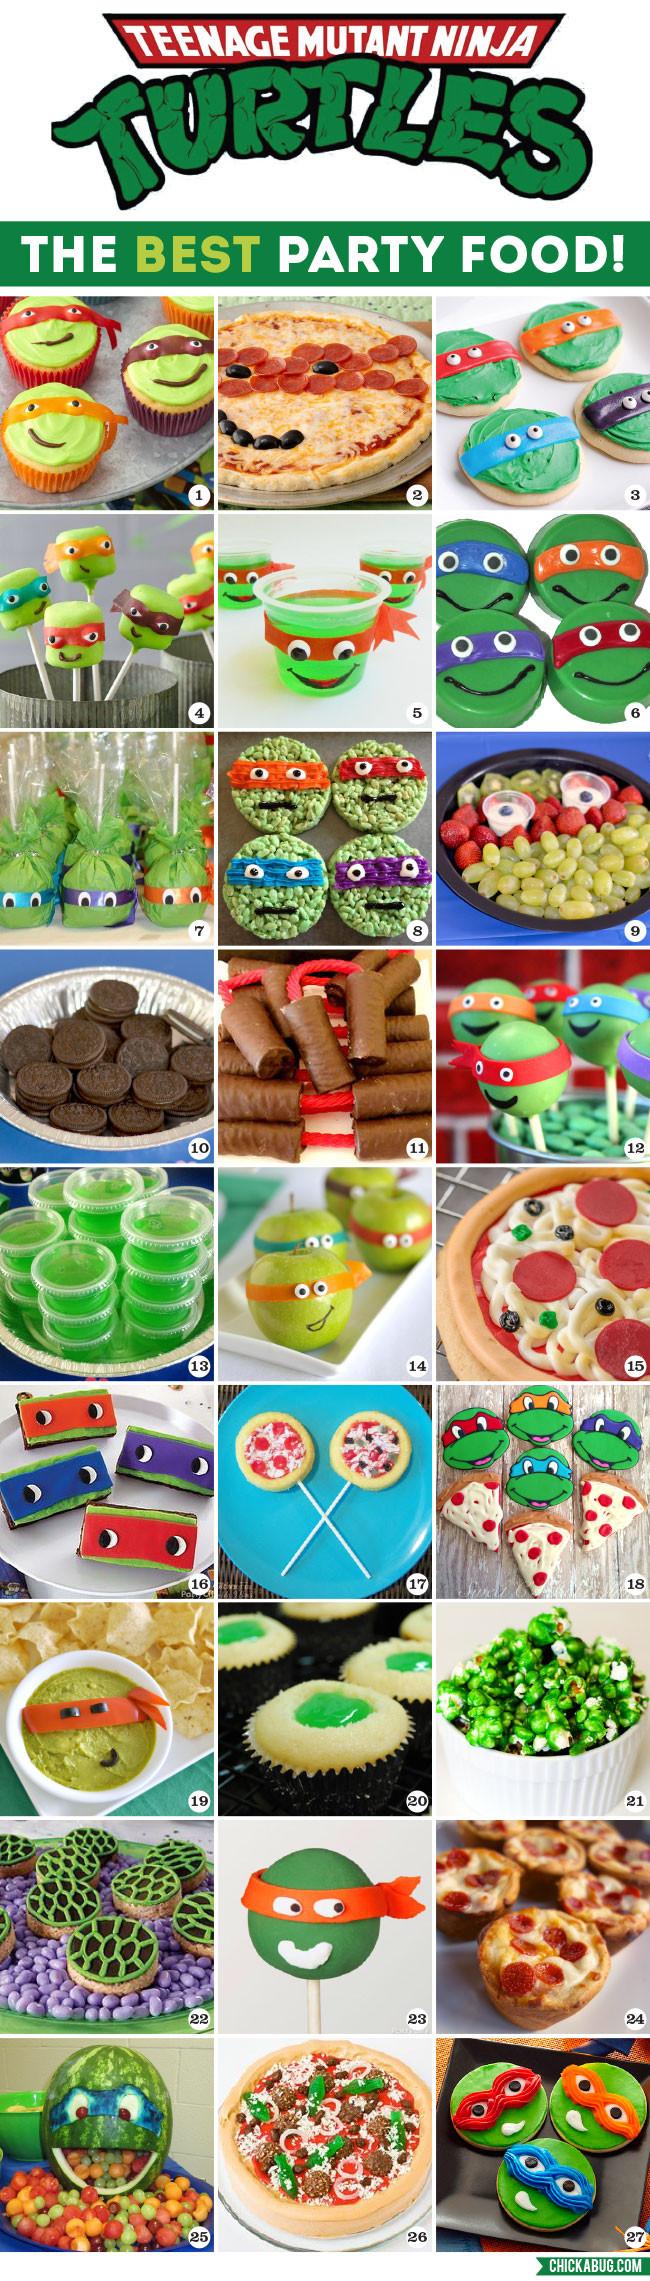 Ninja Turtle Birthday Party Food Ideas  The Best TMNT Party Food